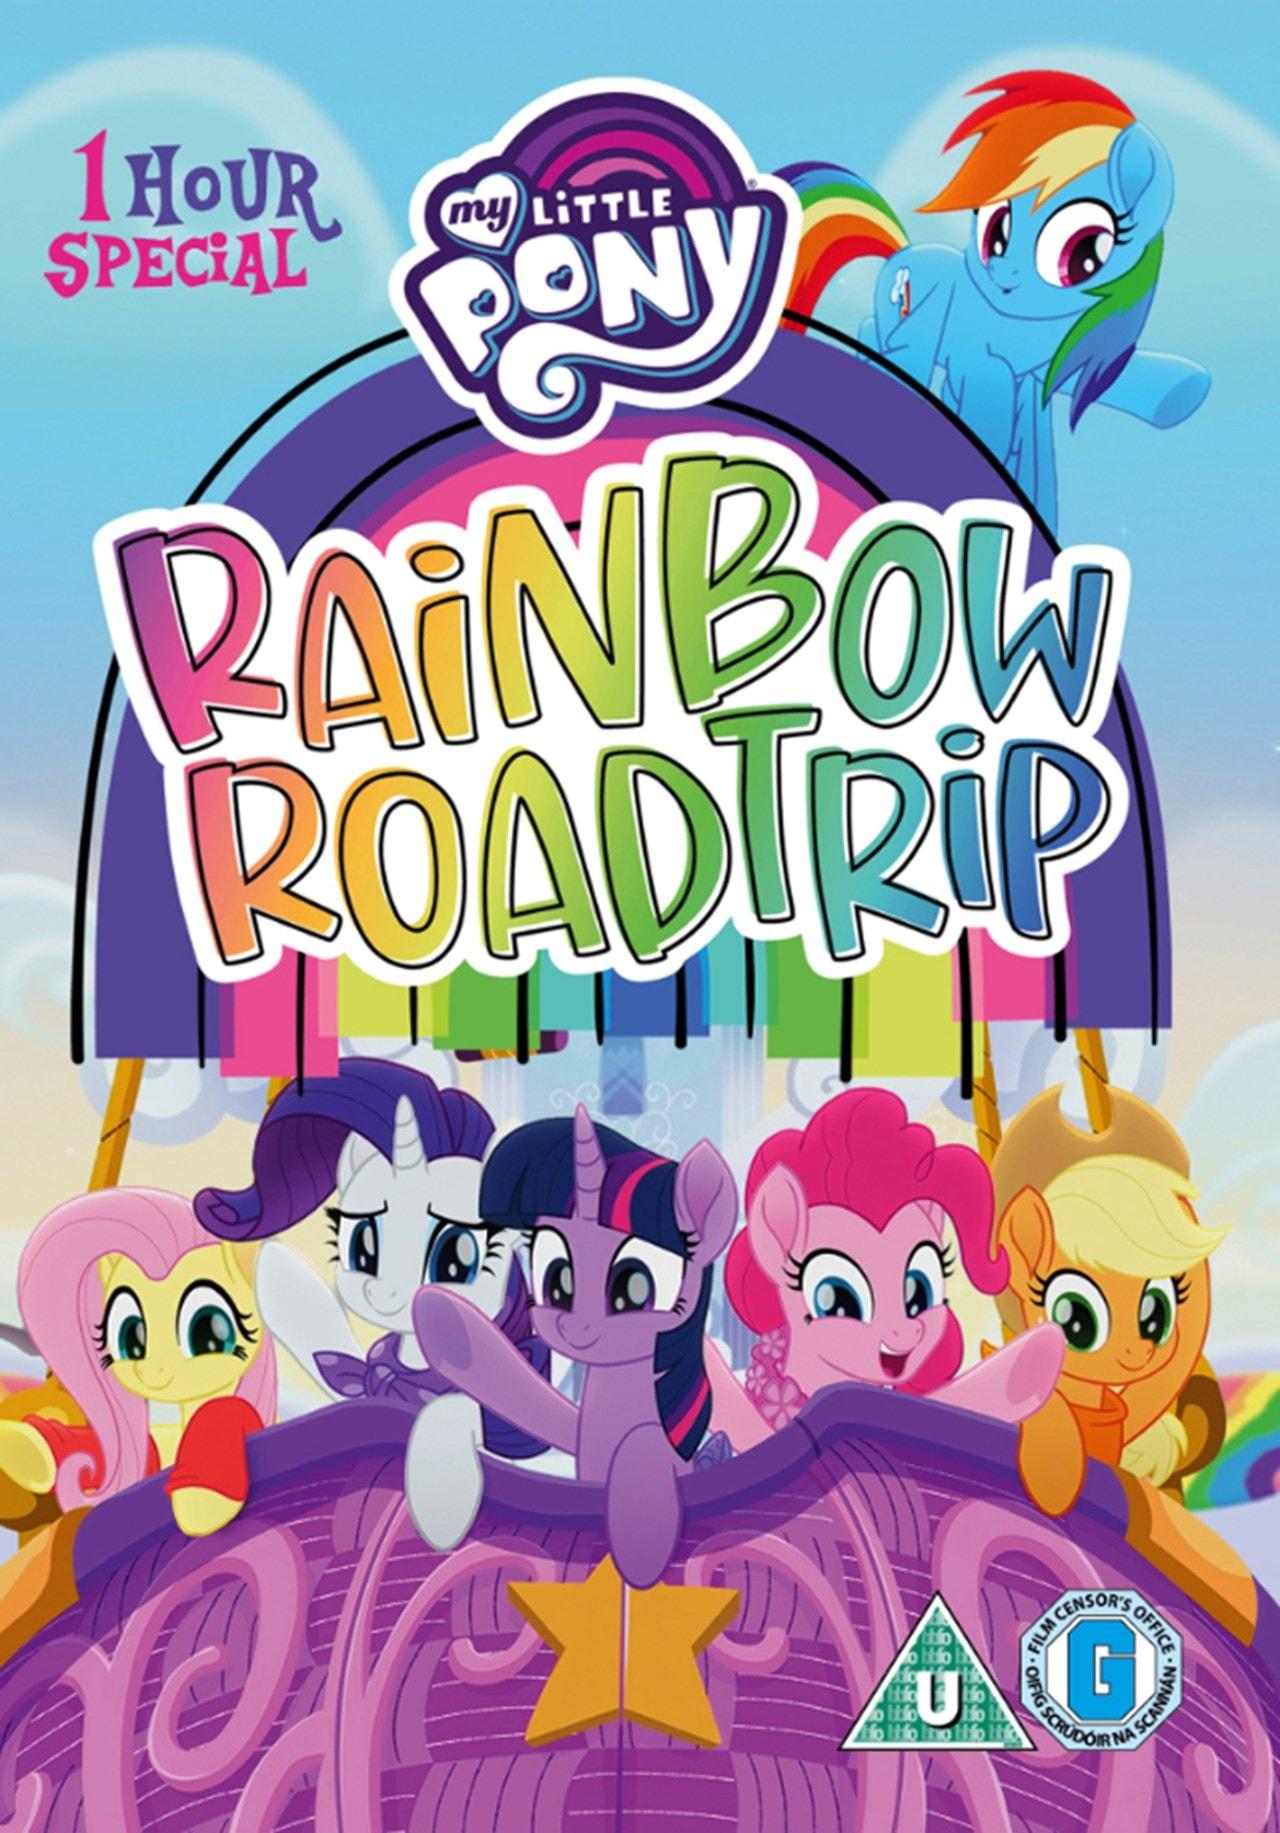 My Little Pony: Friendship is Magic #64 - IDW Publishing